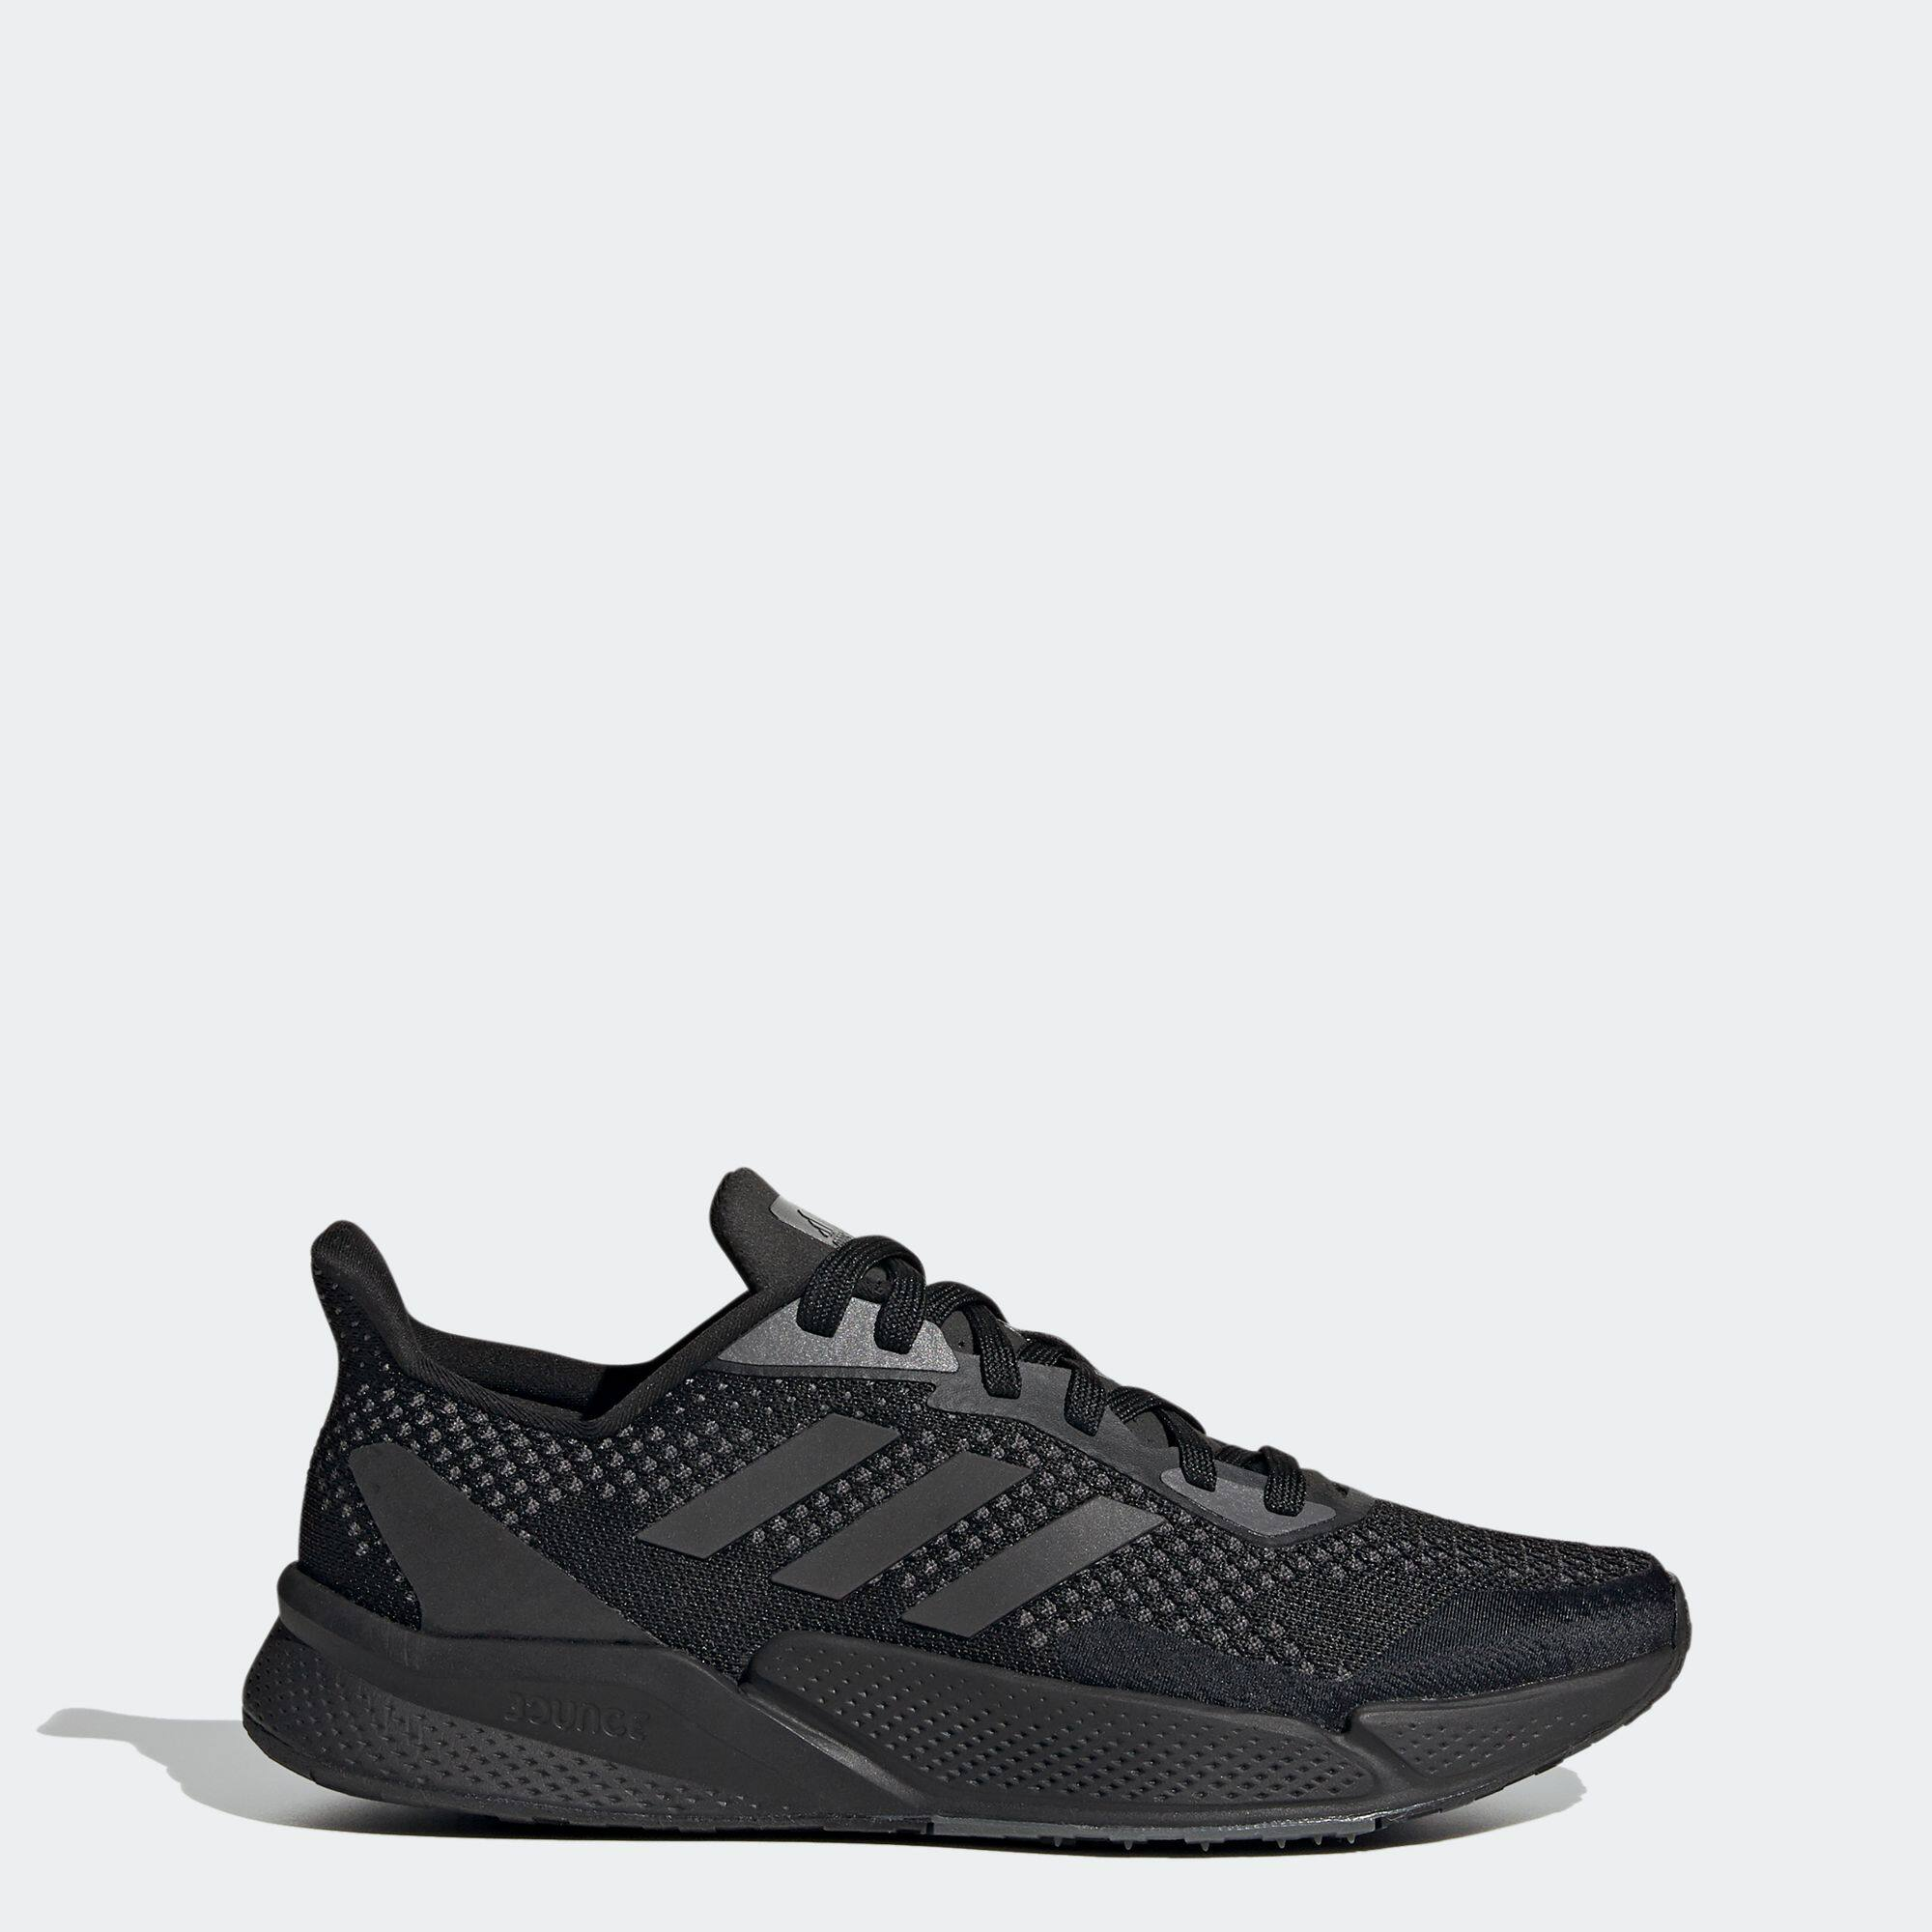 adidas RUNNING รองเท้า X9000L2 ผู้หญิง สีดำ EH0040